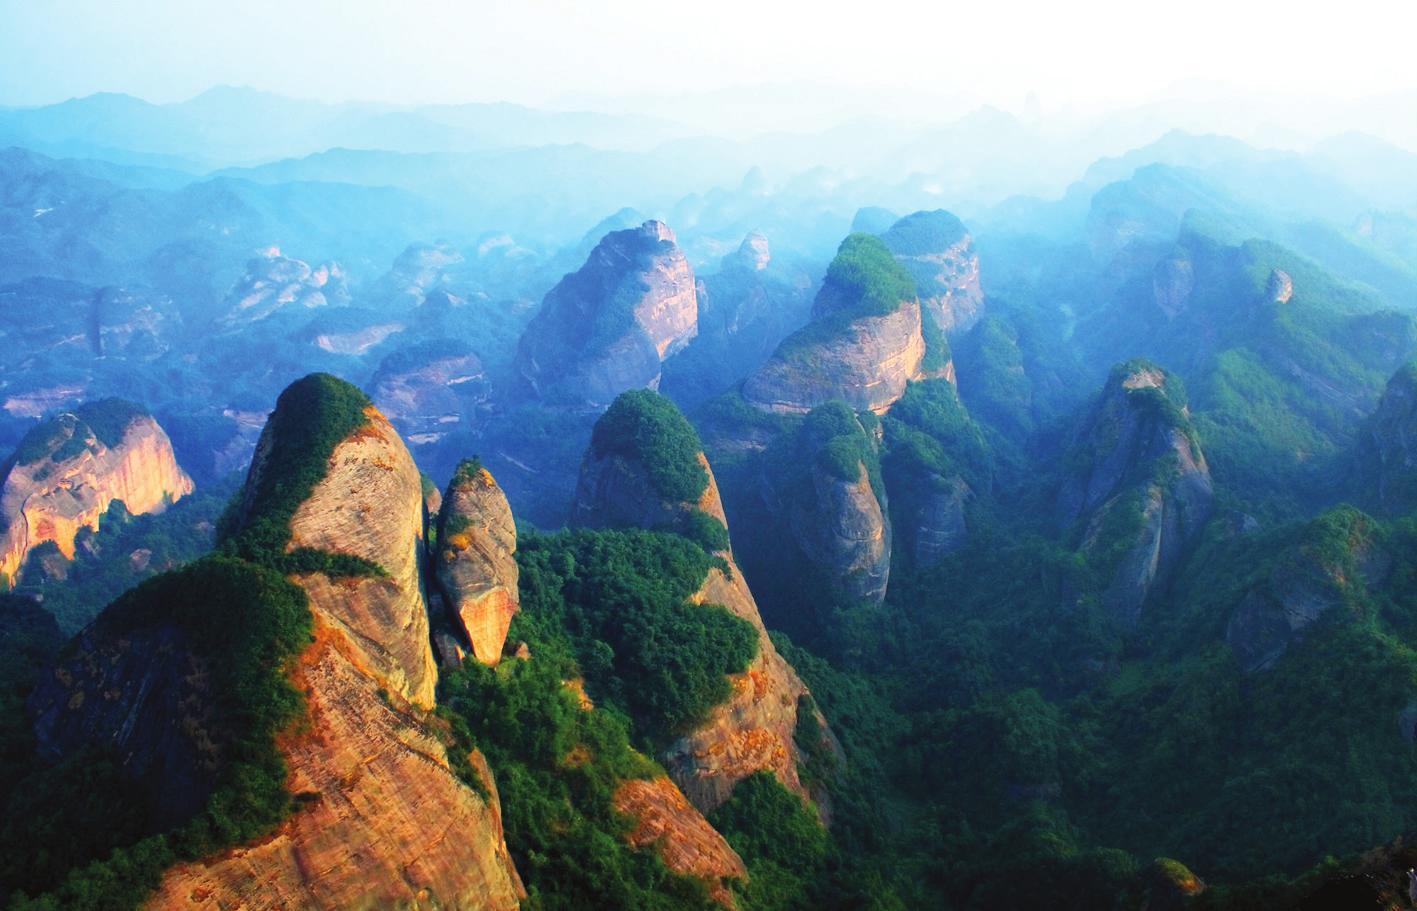 Mount Danxia - Wikipedia